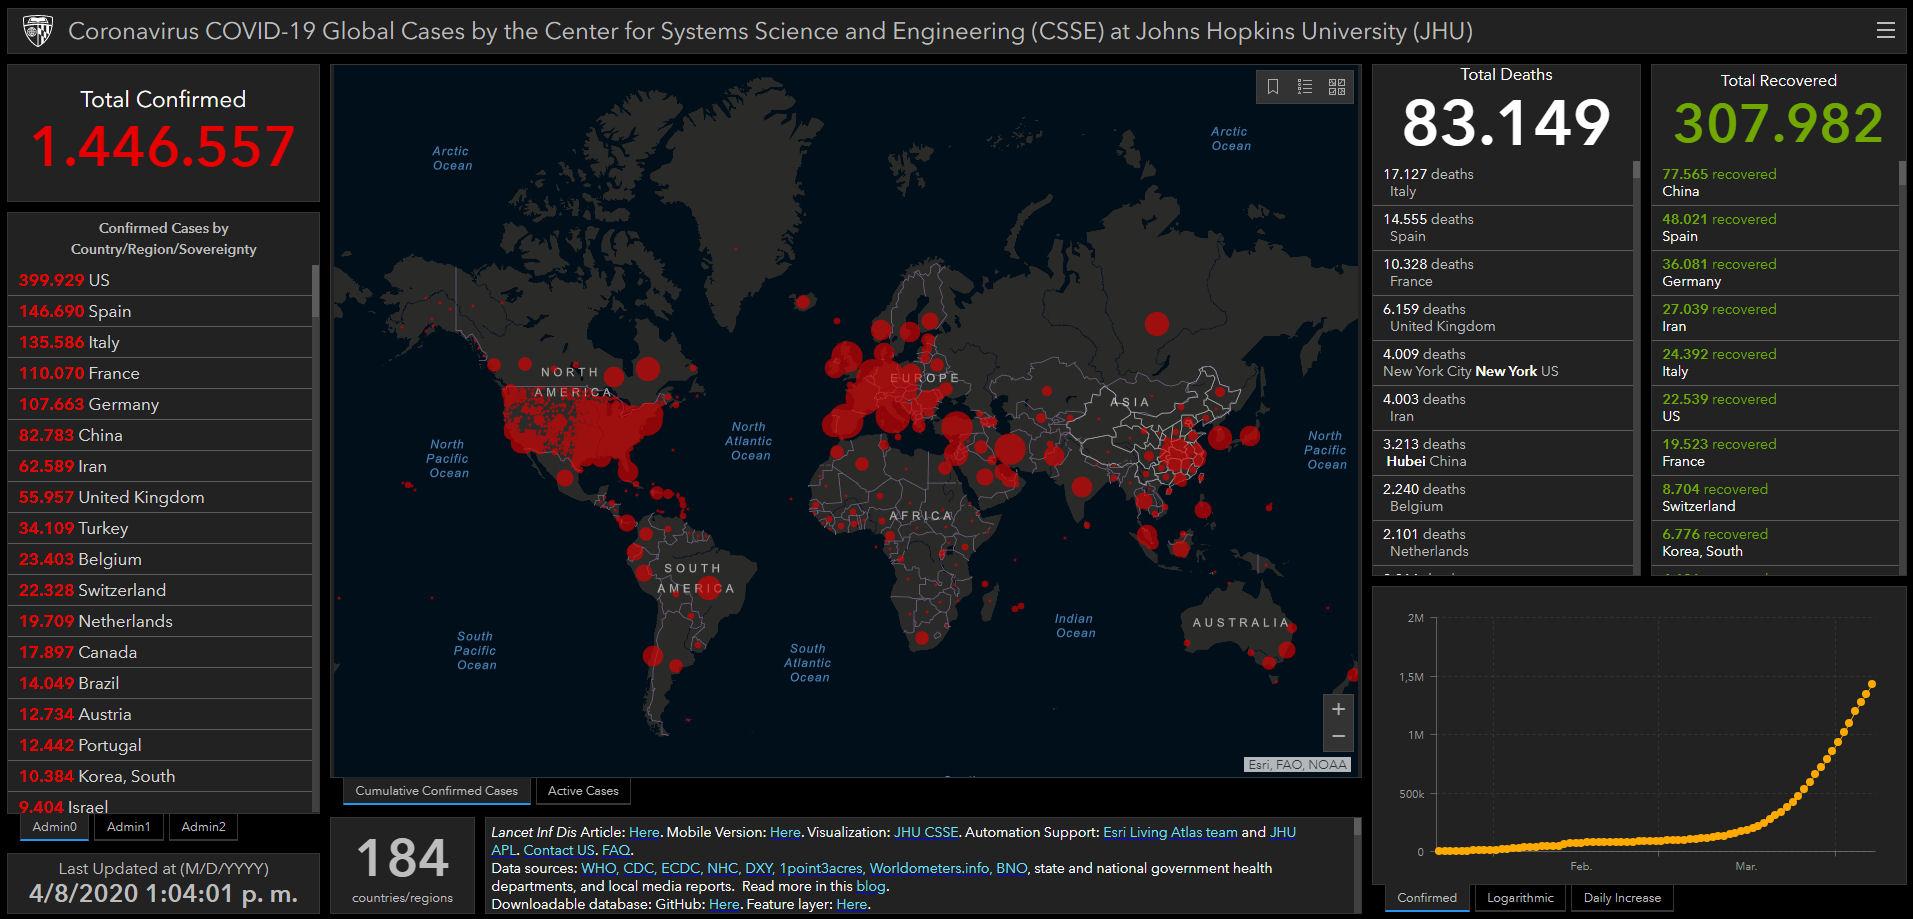 coronavirus covid-19 estadisticas globales mapa 8 abril 2020